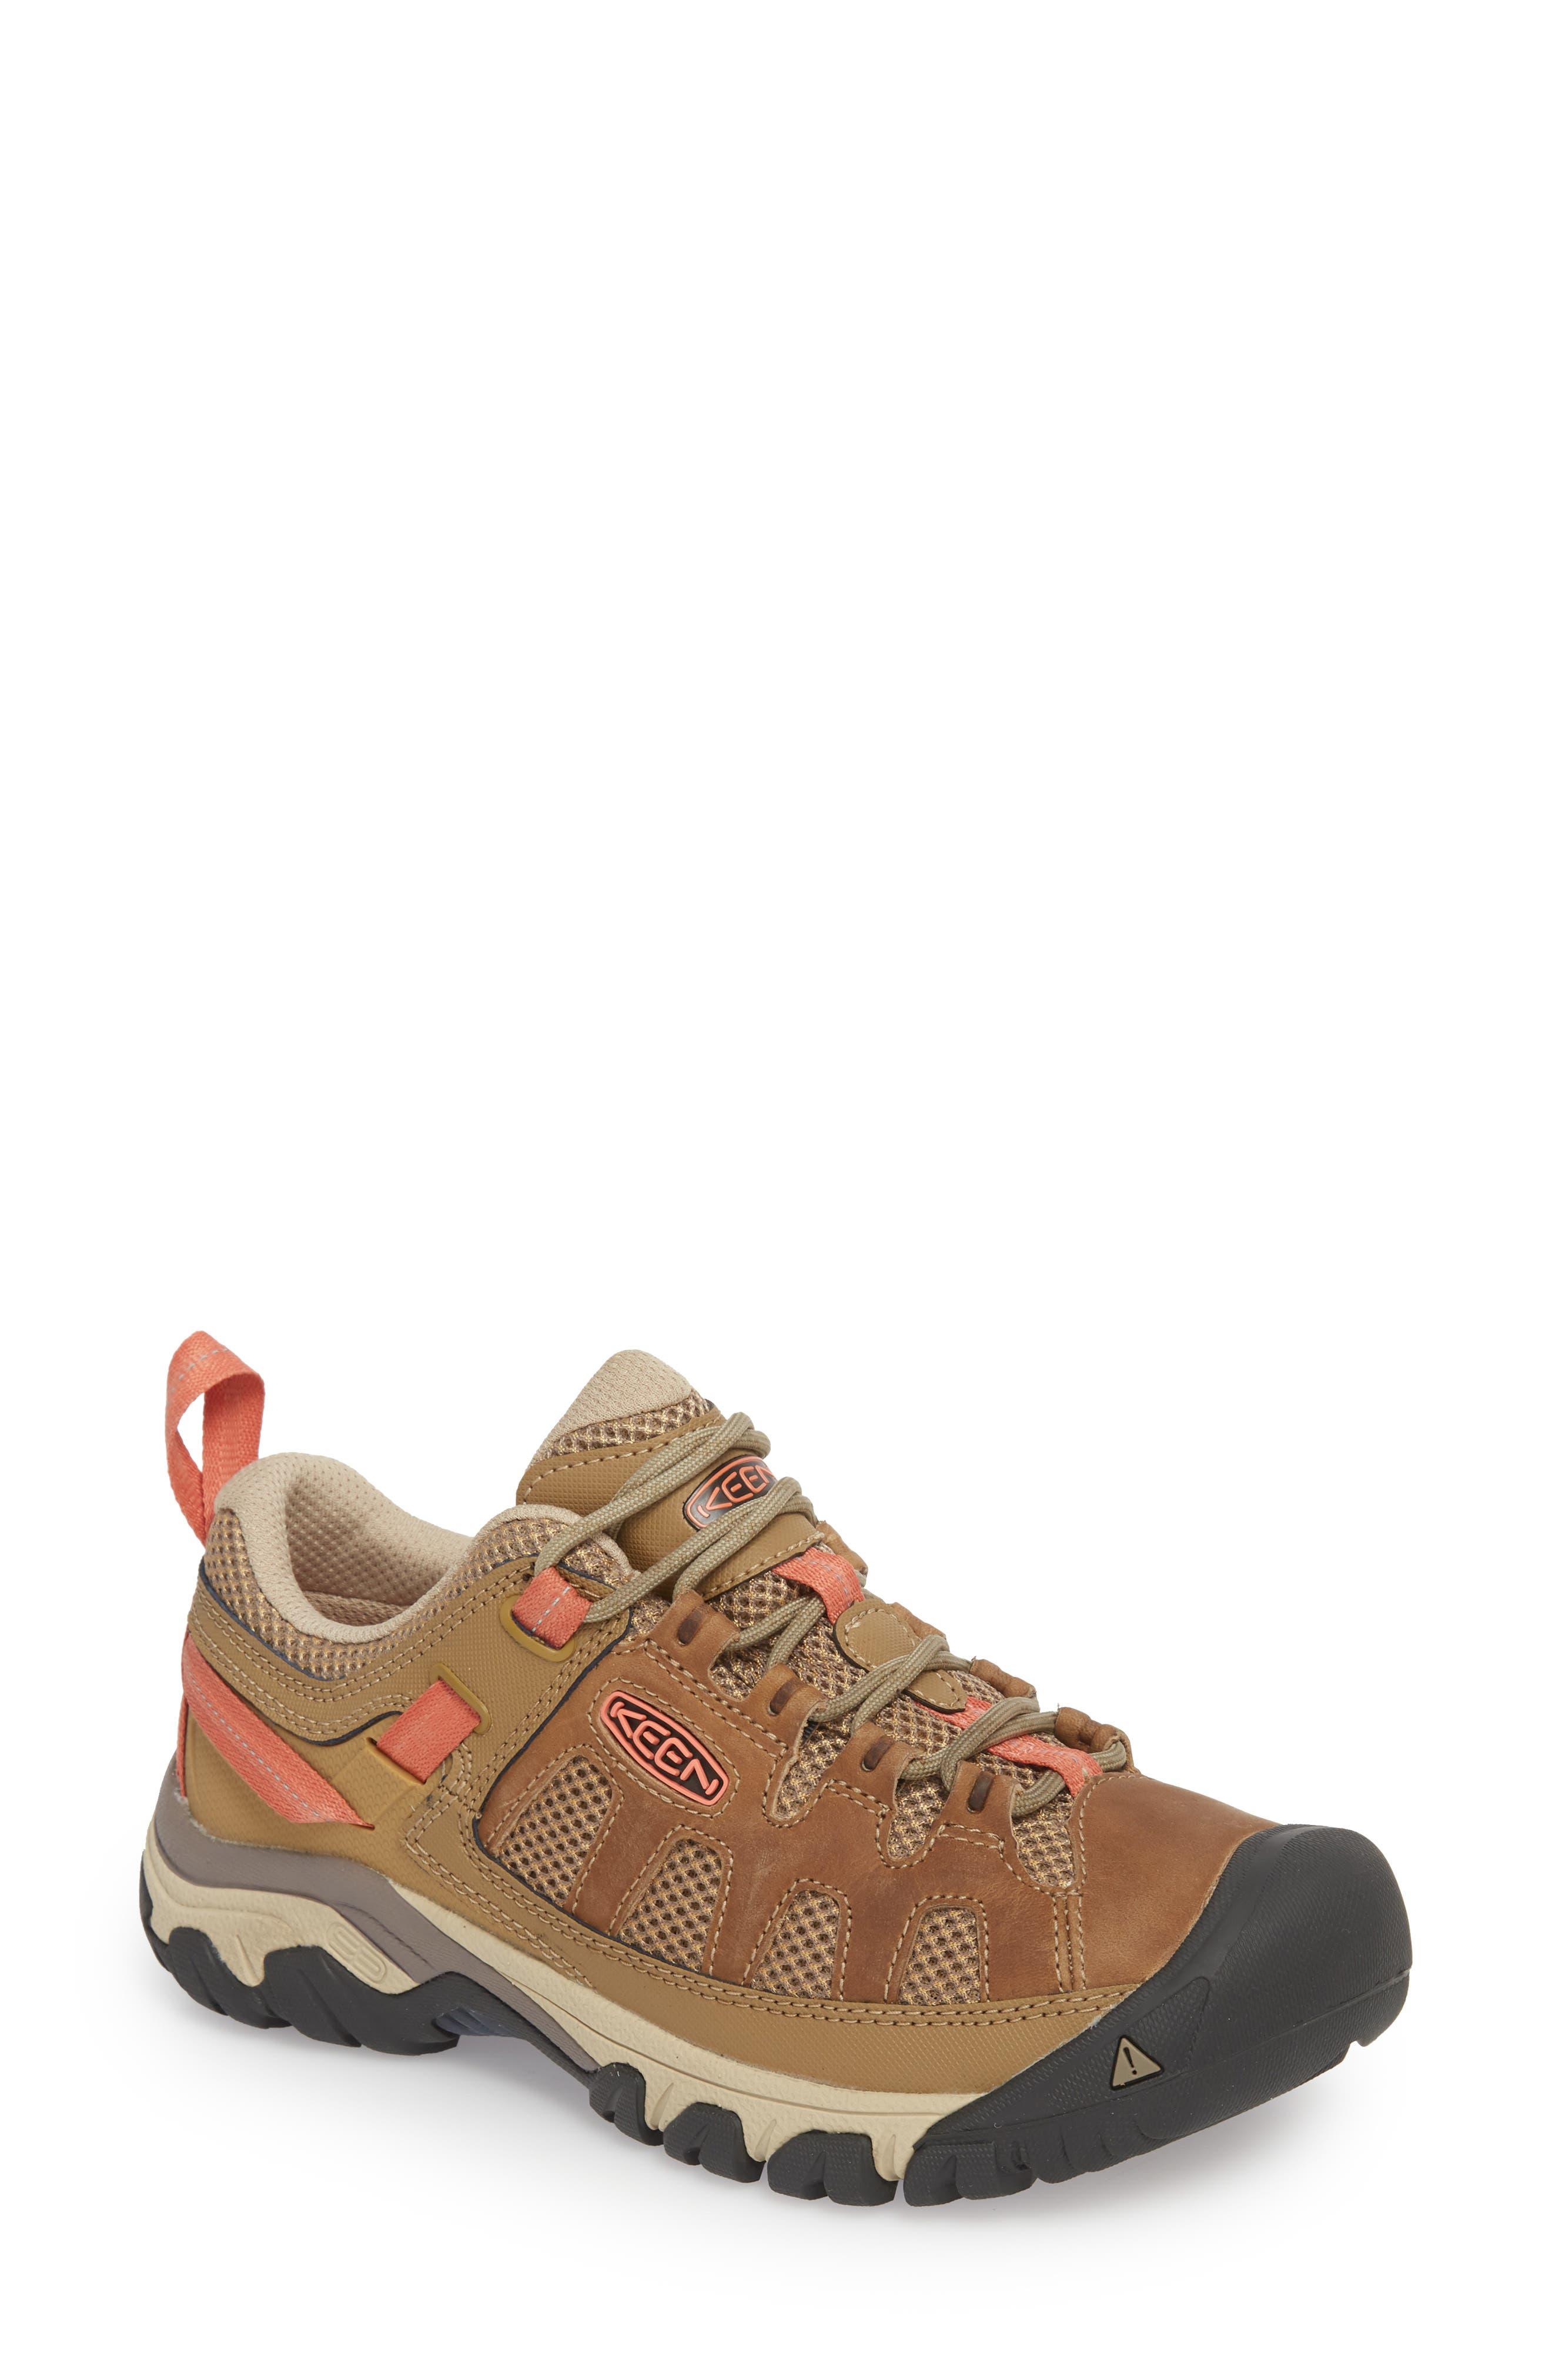 Targhee Vent Hiking Shoe,                             Main thumbnail 1, color,                             Sandy/ Cornstalk Leather